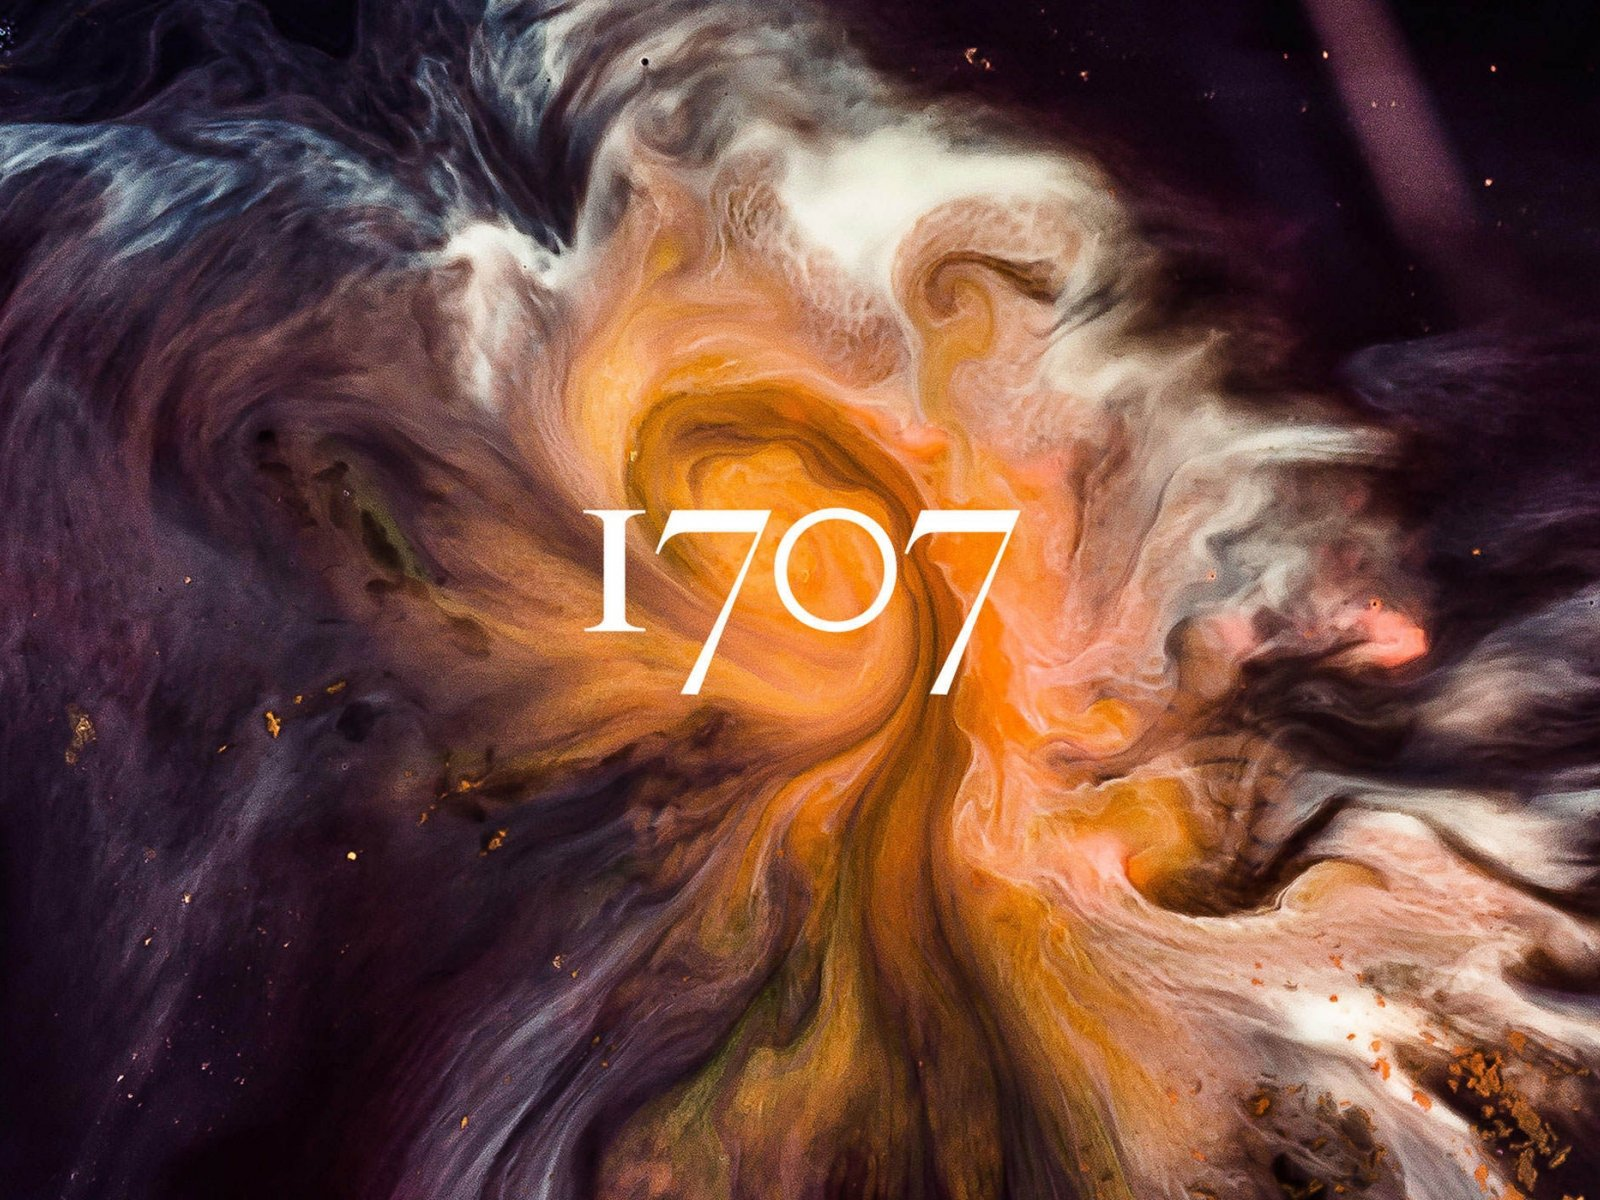 1707 Id